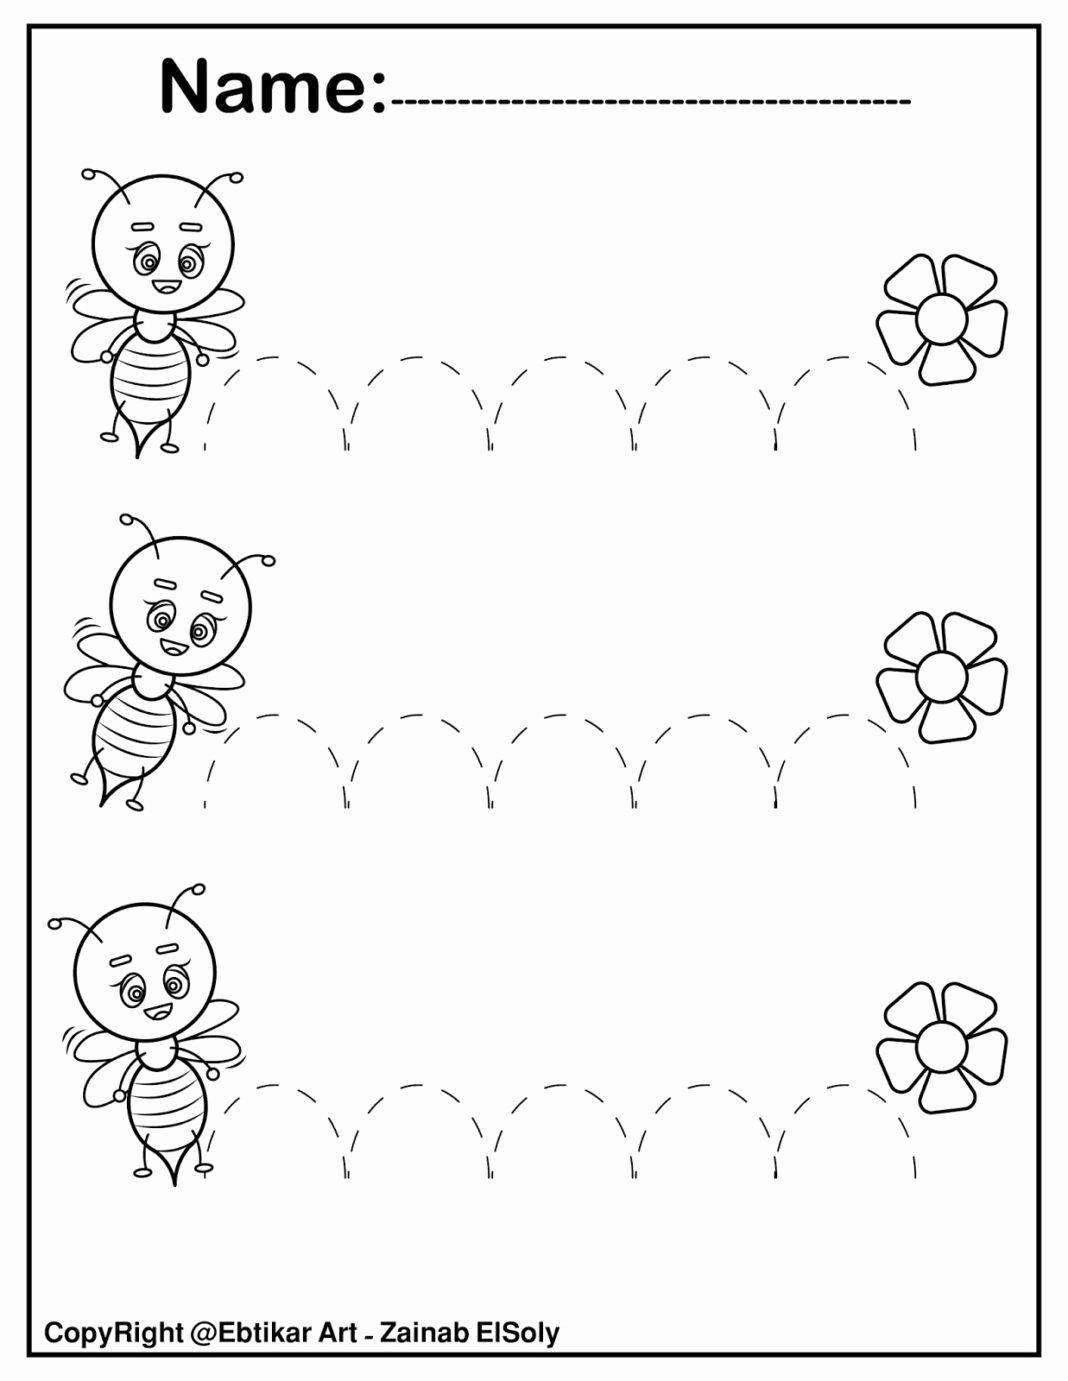 Fine Motor Worksheets for Preschoolers Free Worksheets Set Fine Motor Tracing Activity Writing for